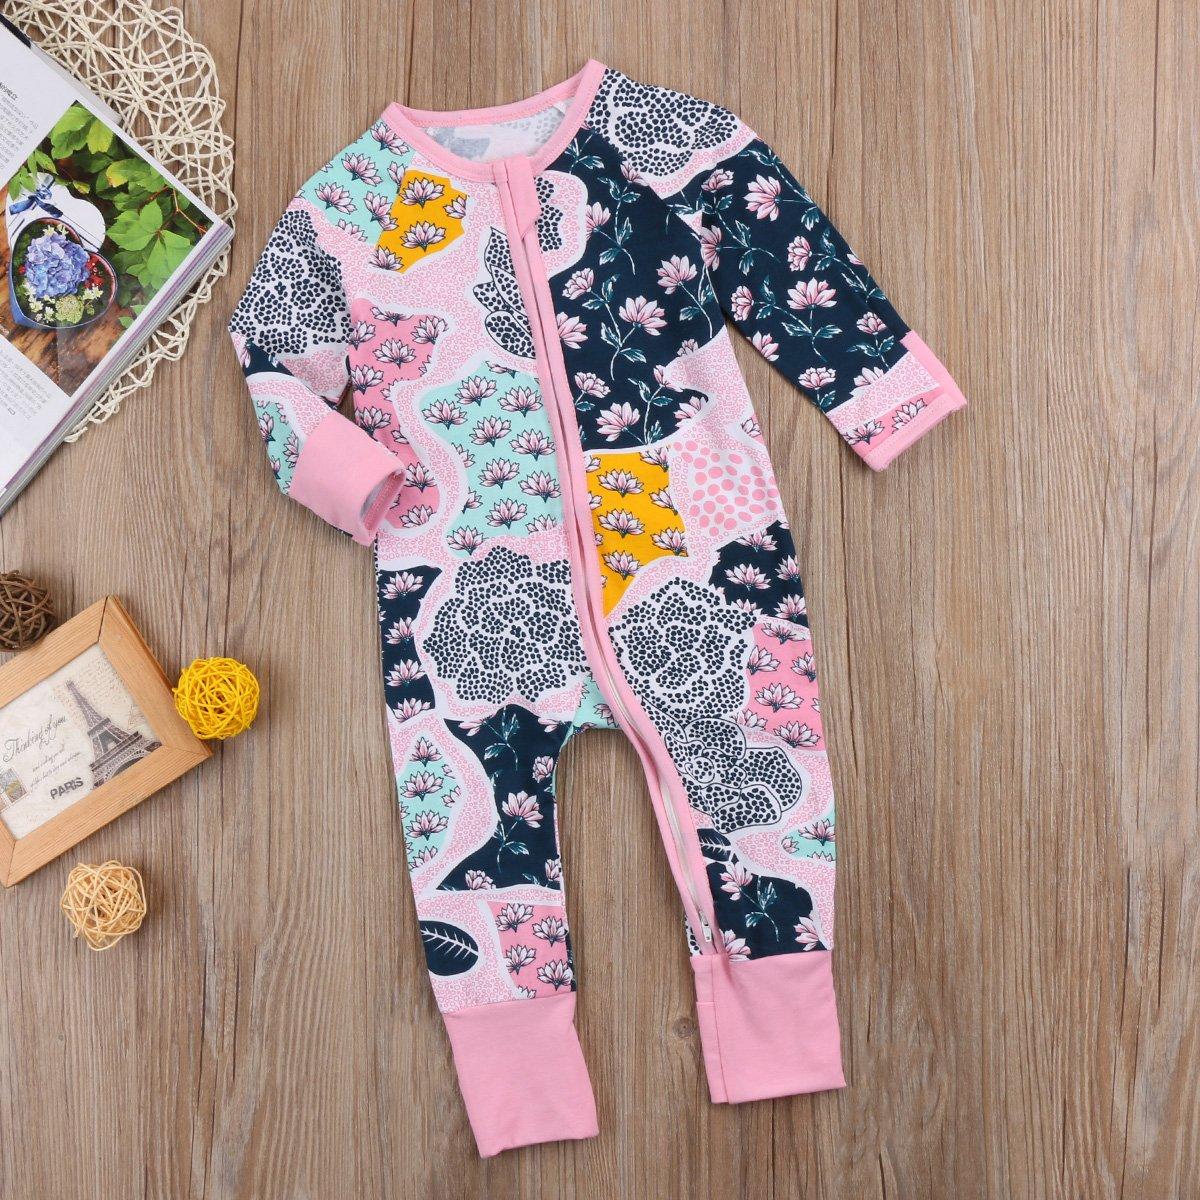 Amazon.com: Bebé recién nacido niña Pajamas Sleeper Ropa ...